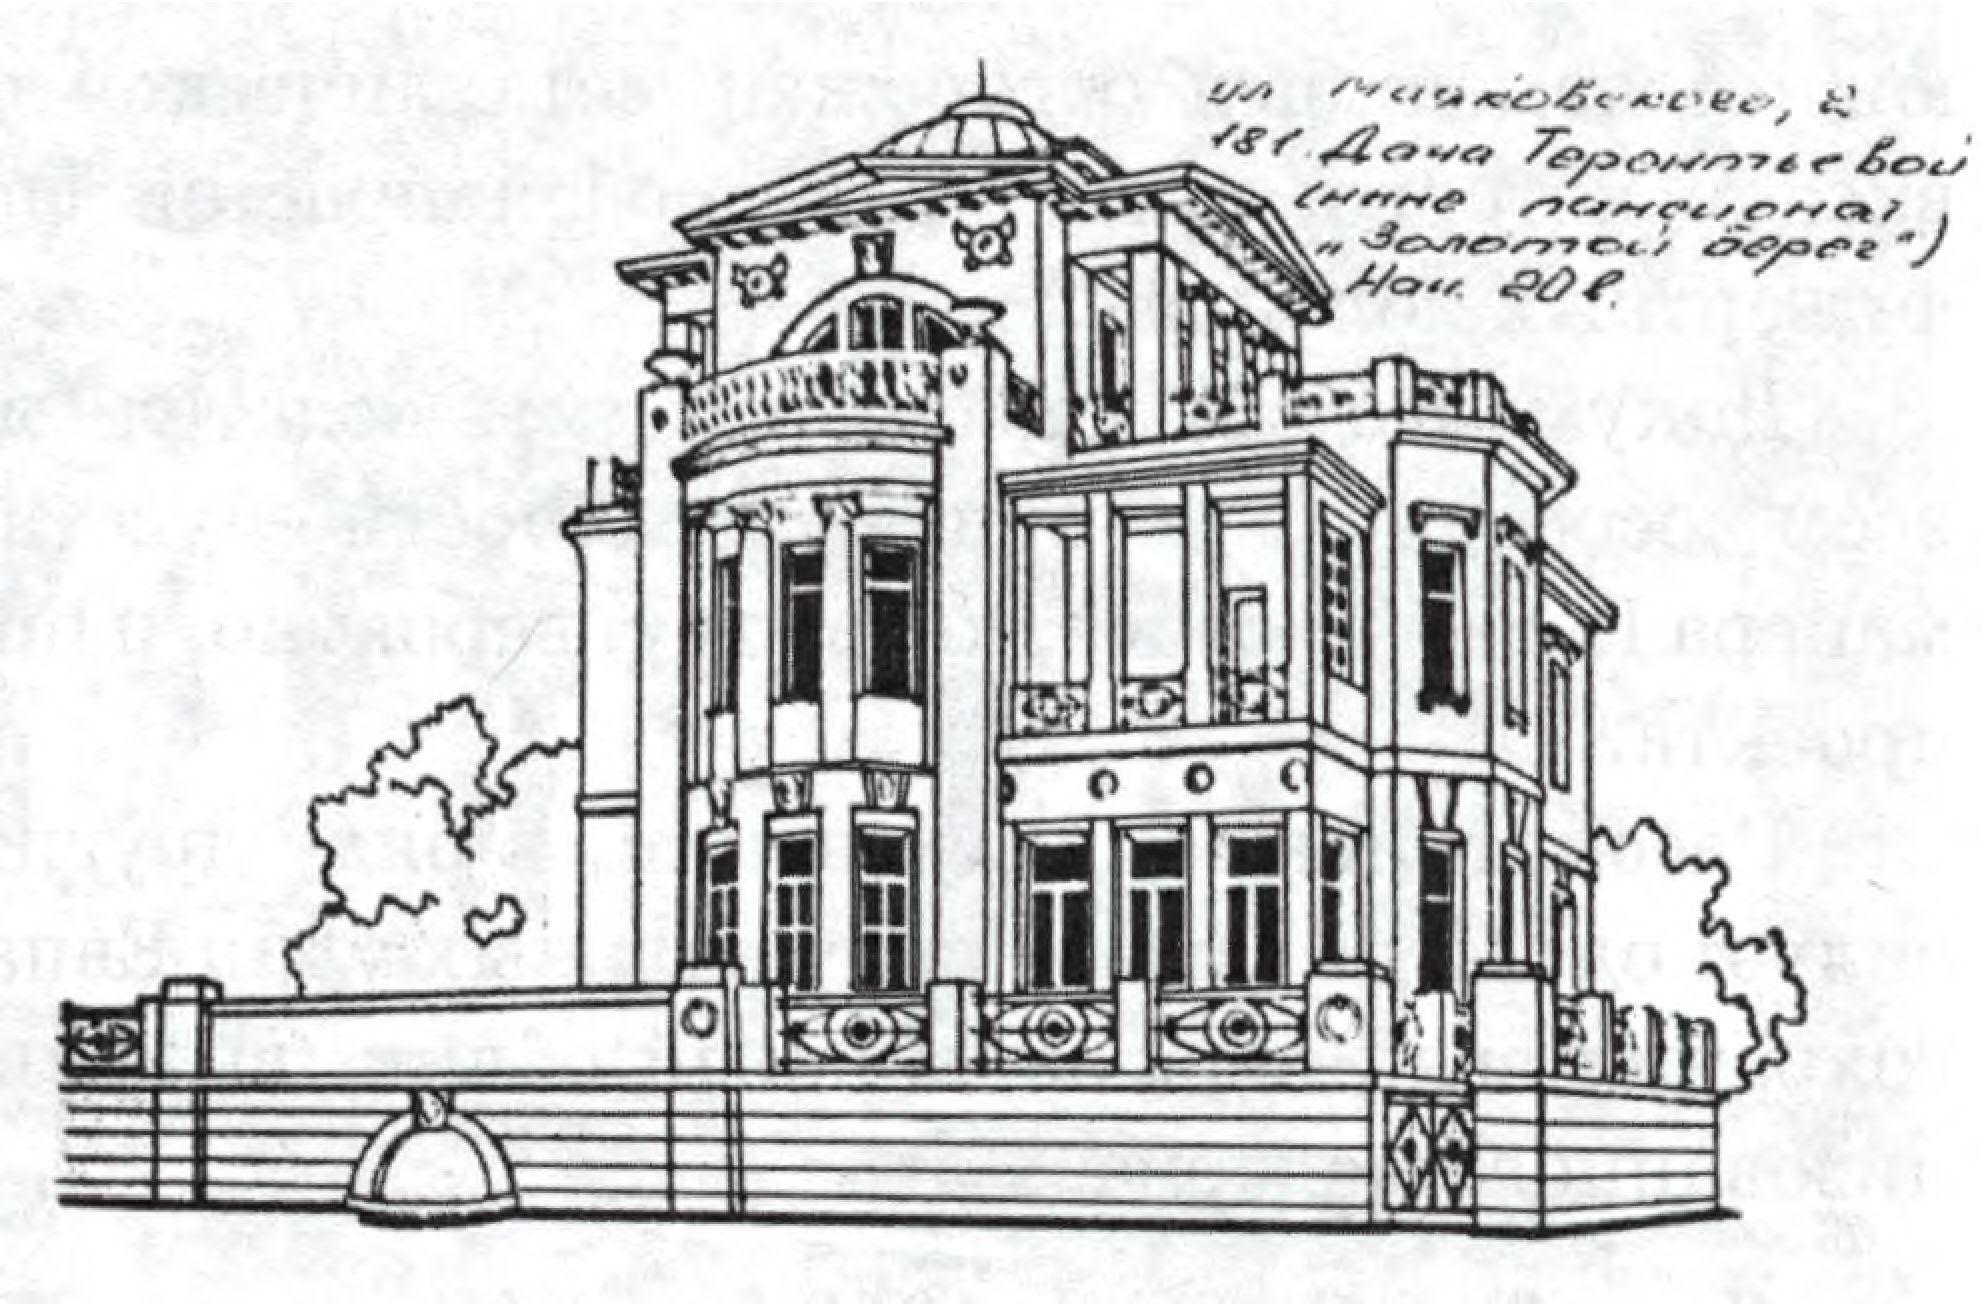 Дача Терентьева. Архитектор П.Я. Сеферов (?). 1910-е гг.